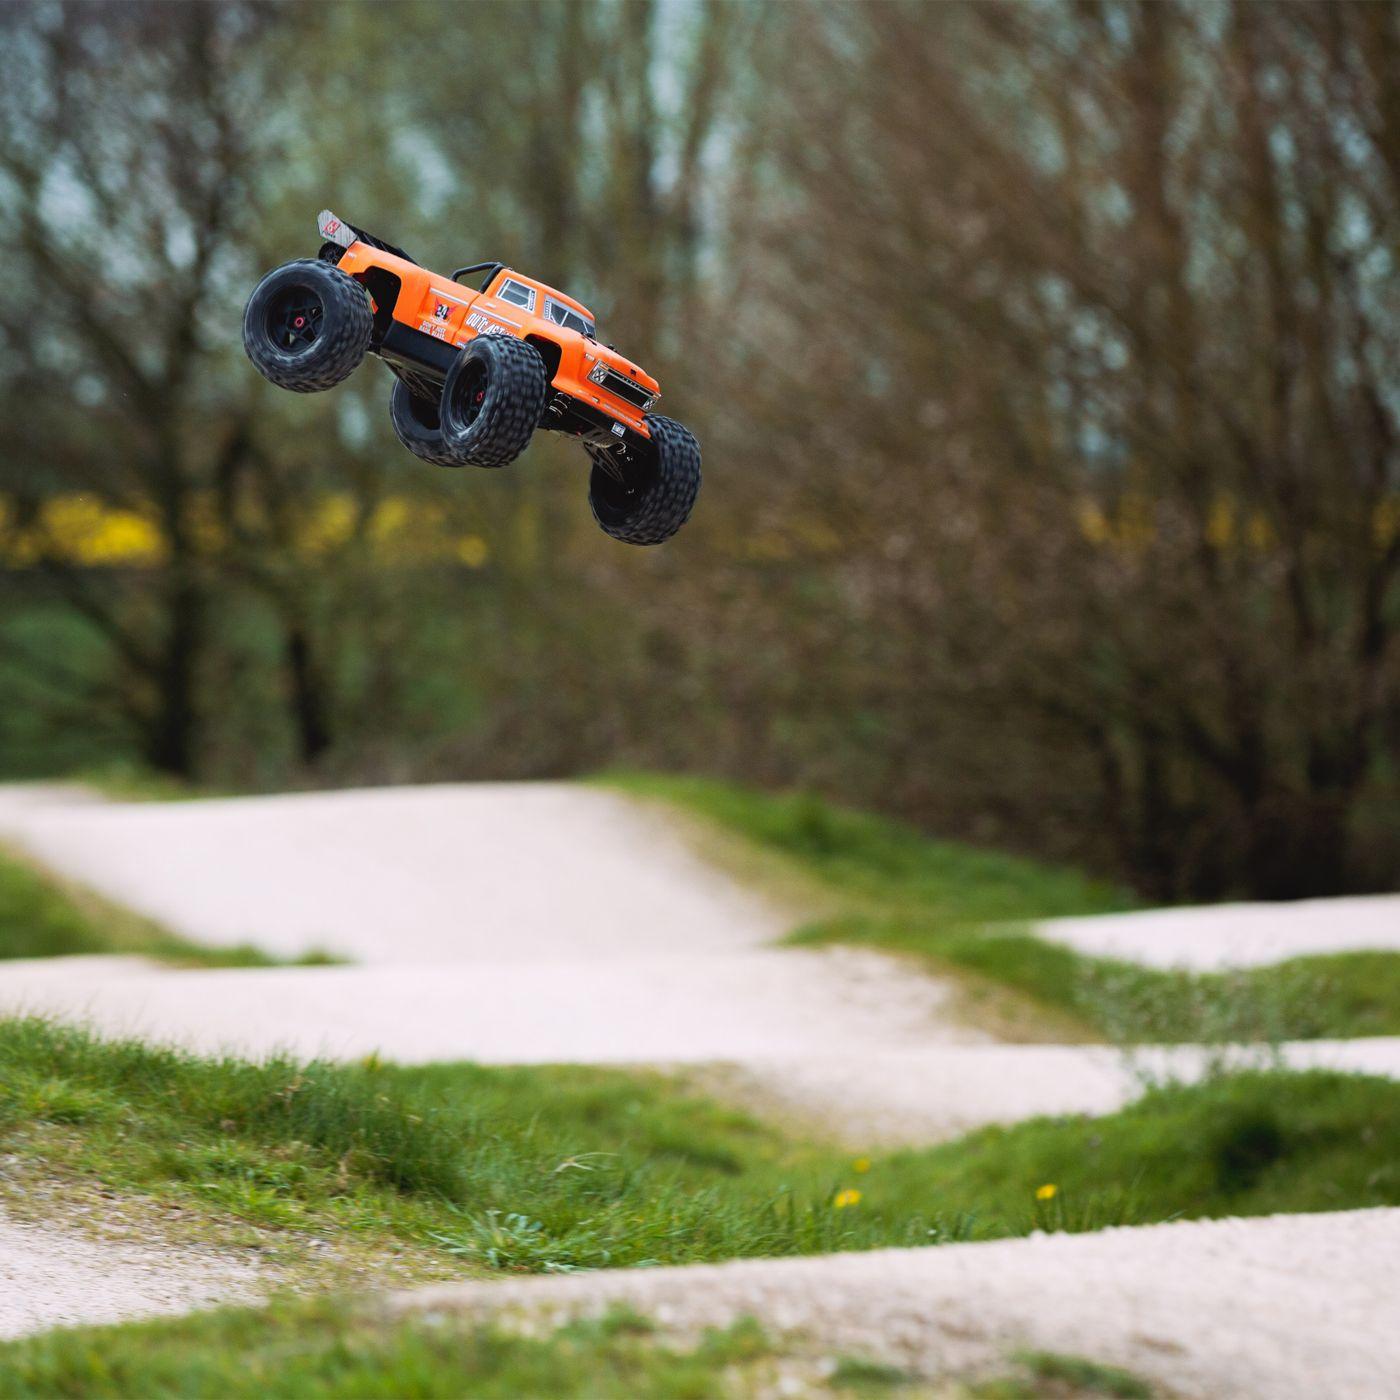 Arrma Outcast 6S BLX 4WD Stunt Truck orange rtr 4